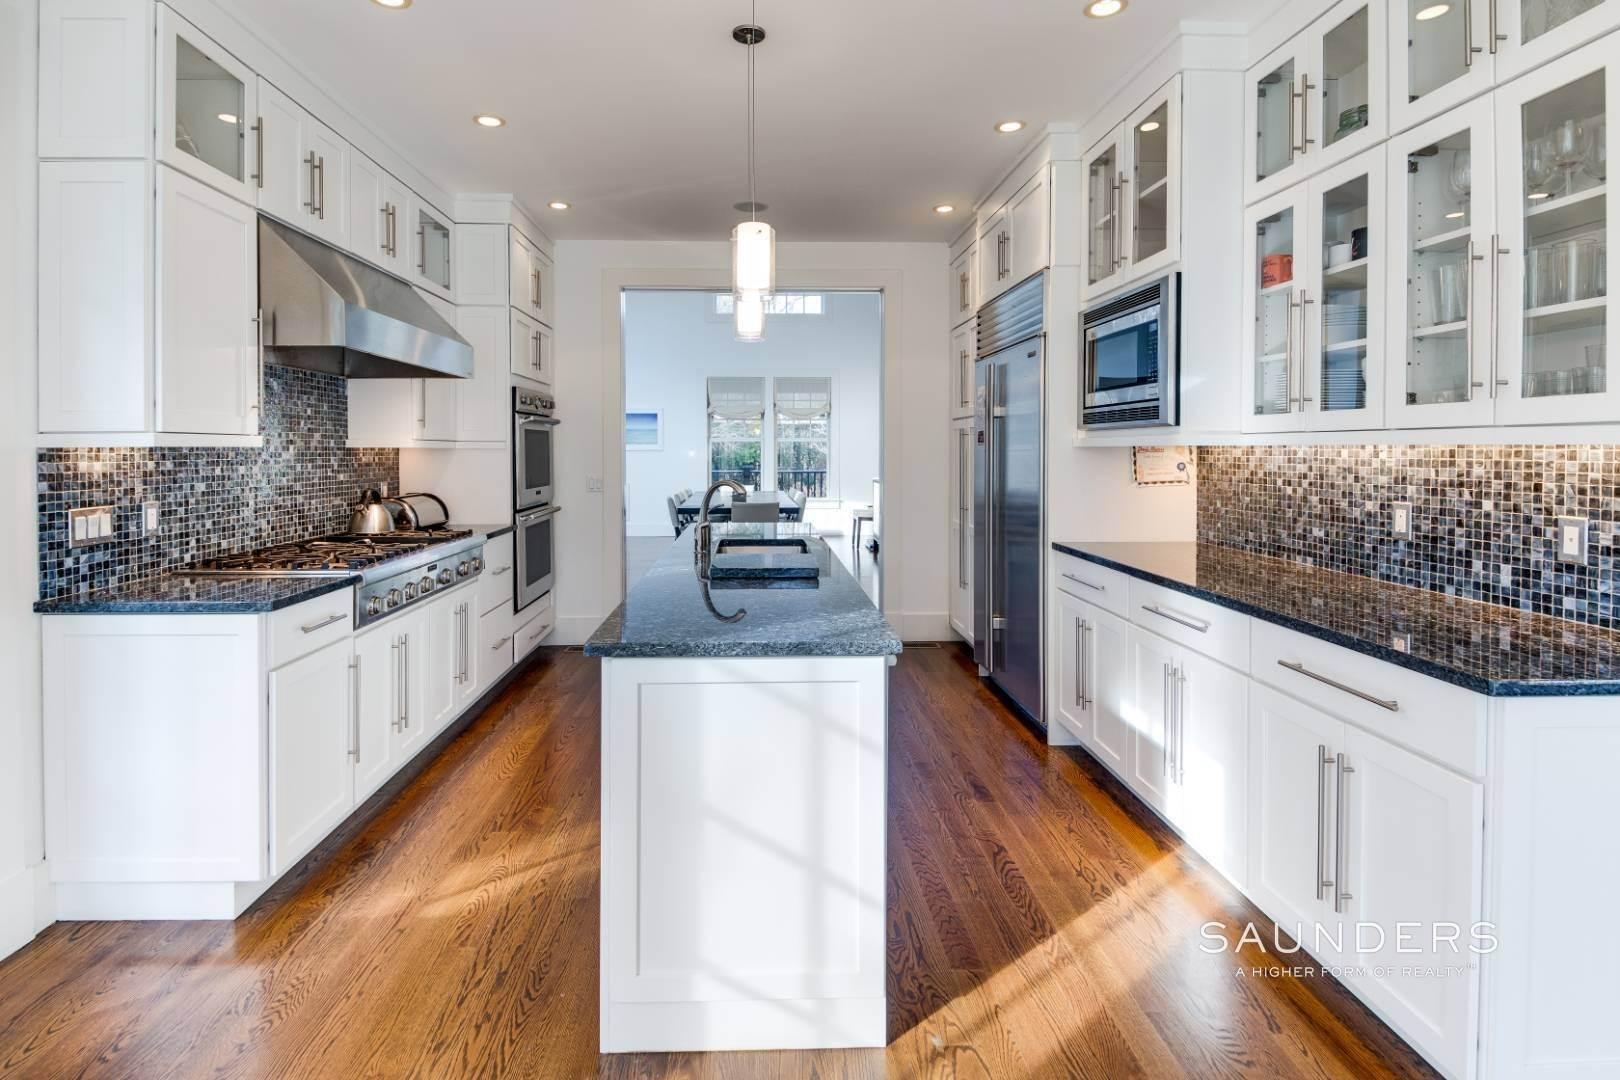 7. Single Family Homes for Sale at Wainscott South Traditional Near Beach Lane 10 Merriwood Drive, Wainscott, East Hampton Town, NY 11975